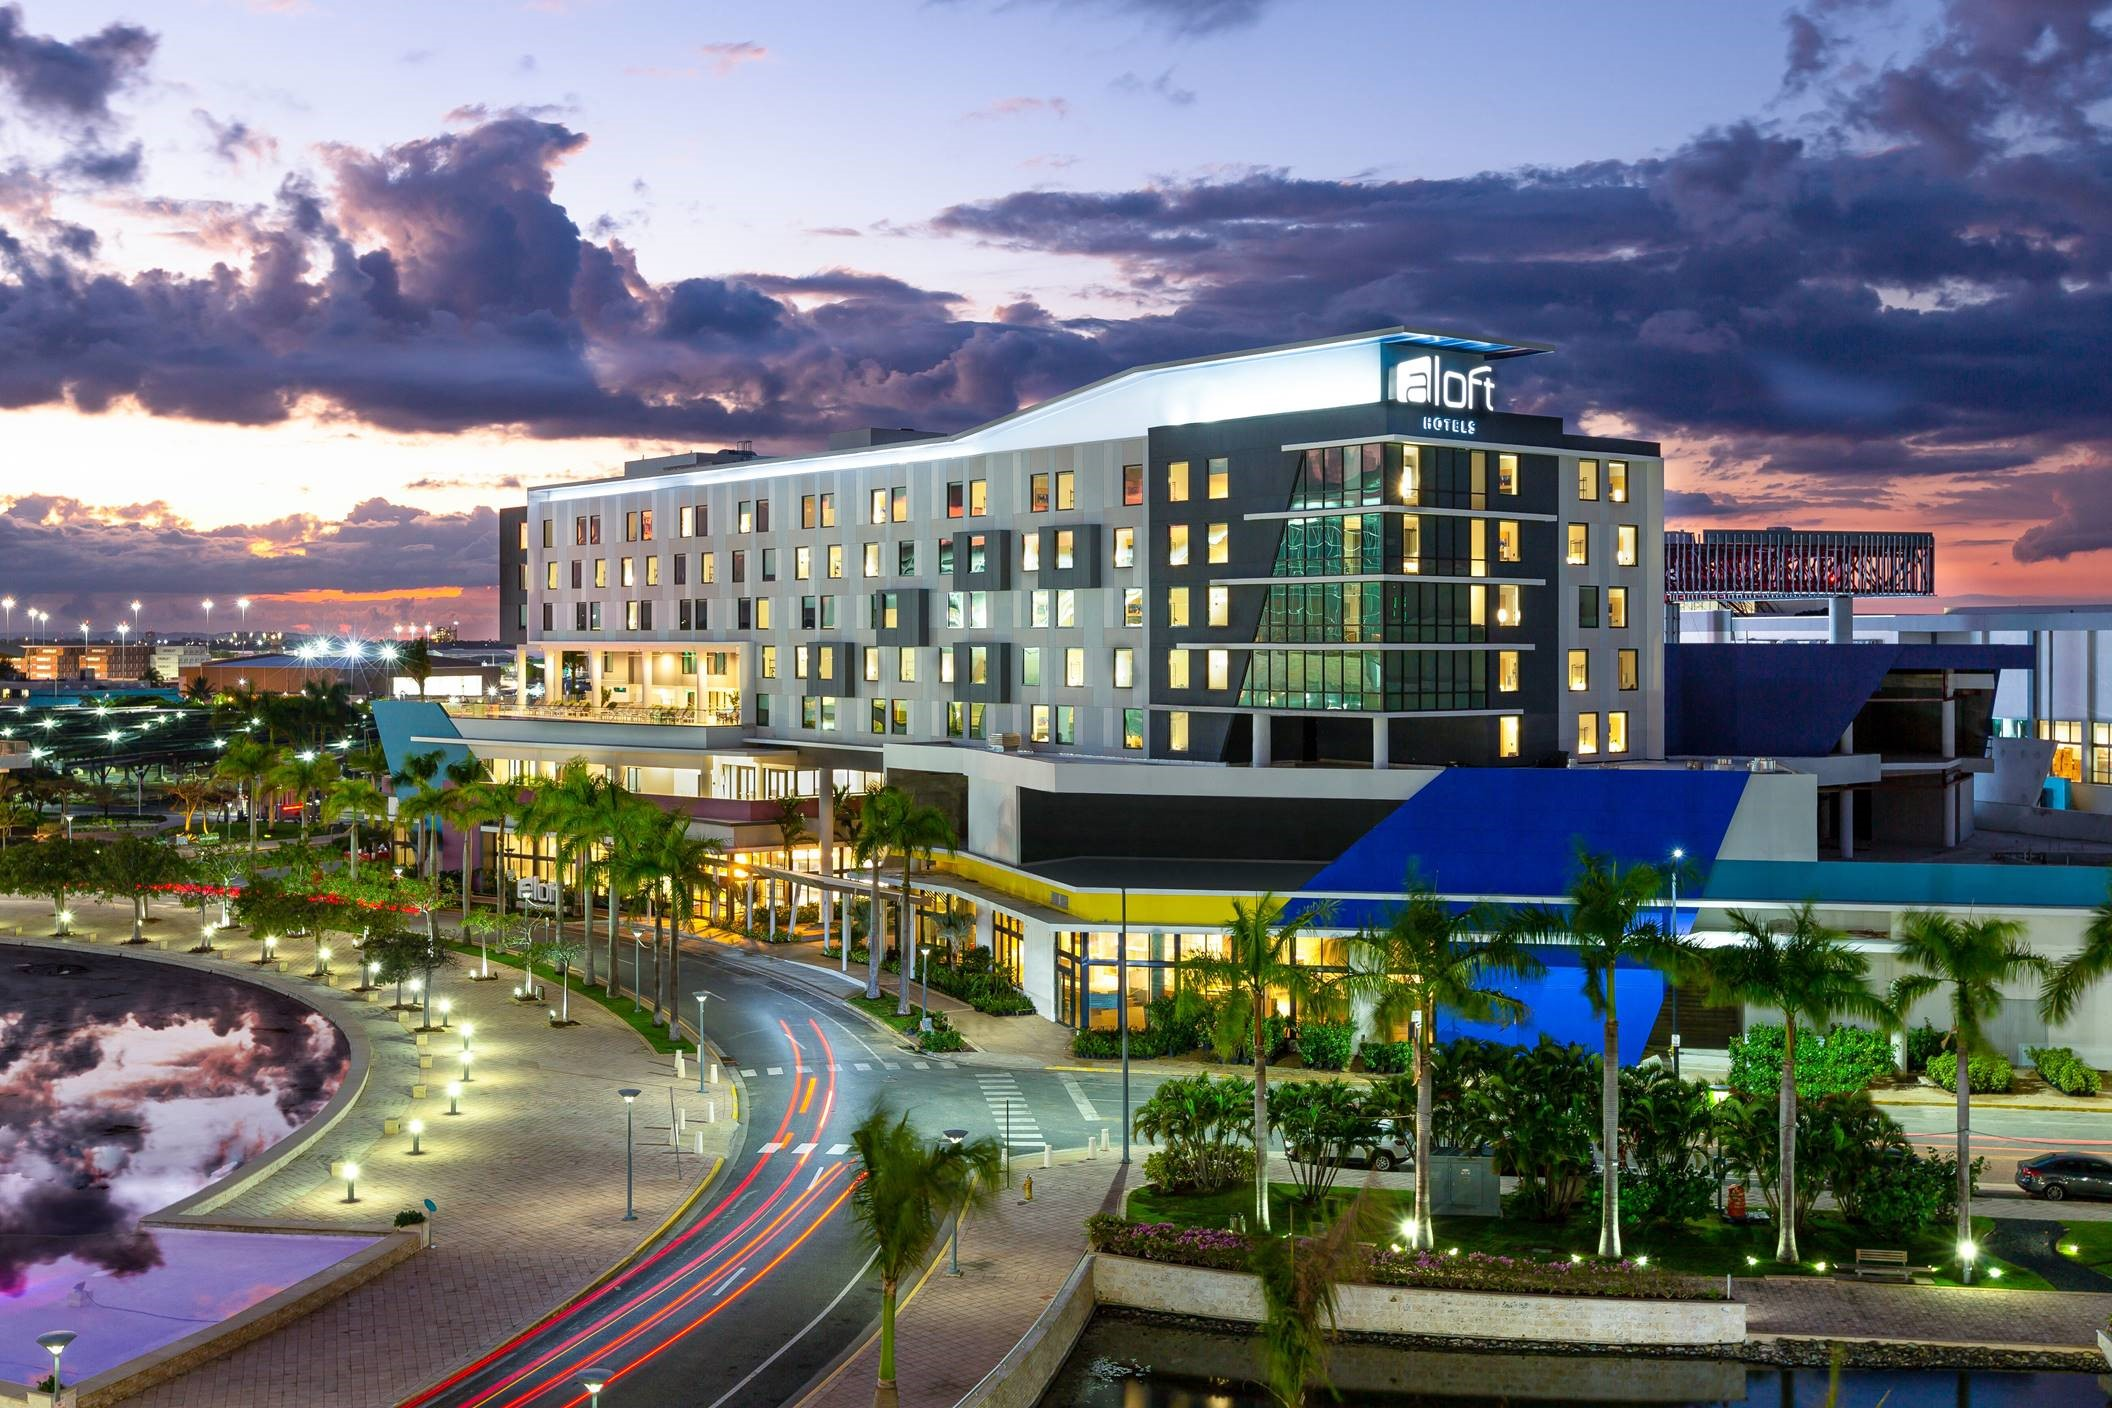 Marriott opens first Aloft Hotel in Puerto Rico's capital San Juan